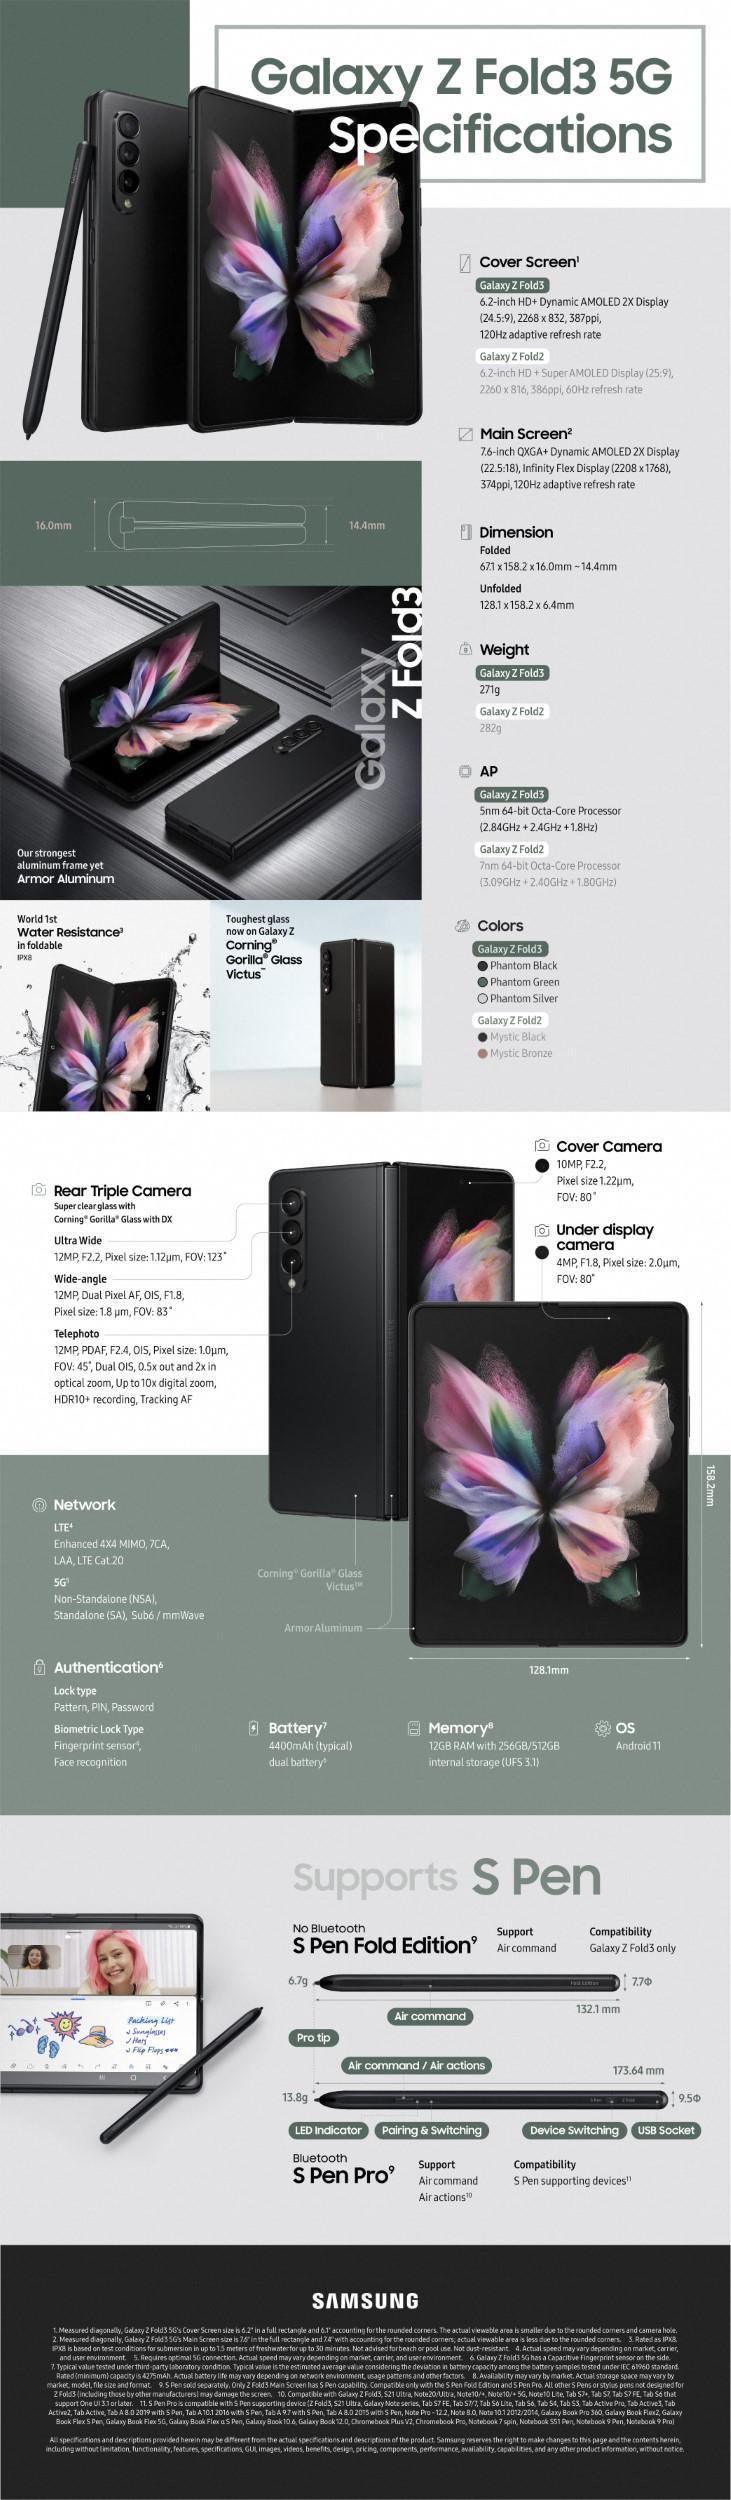 Samsung Galaxy Z Fold3 5G Specs